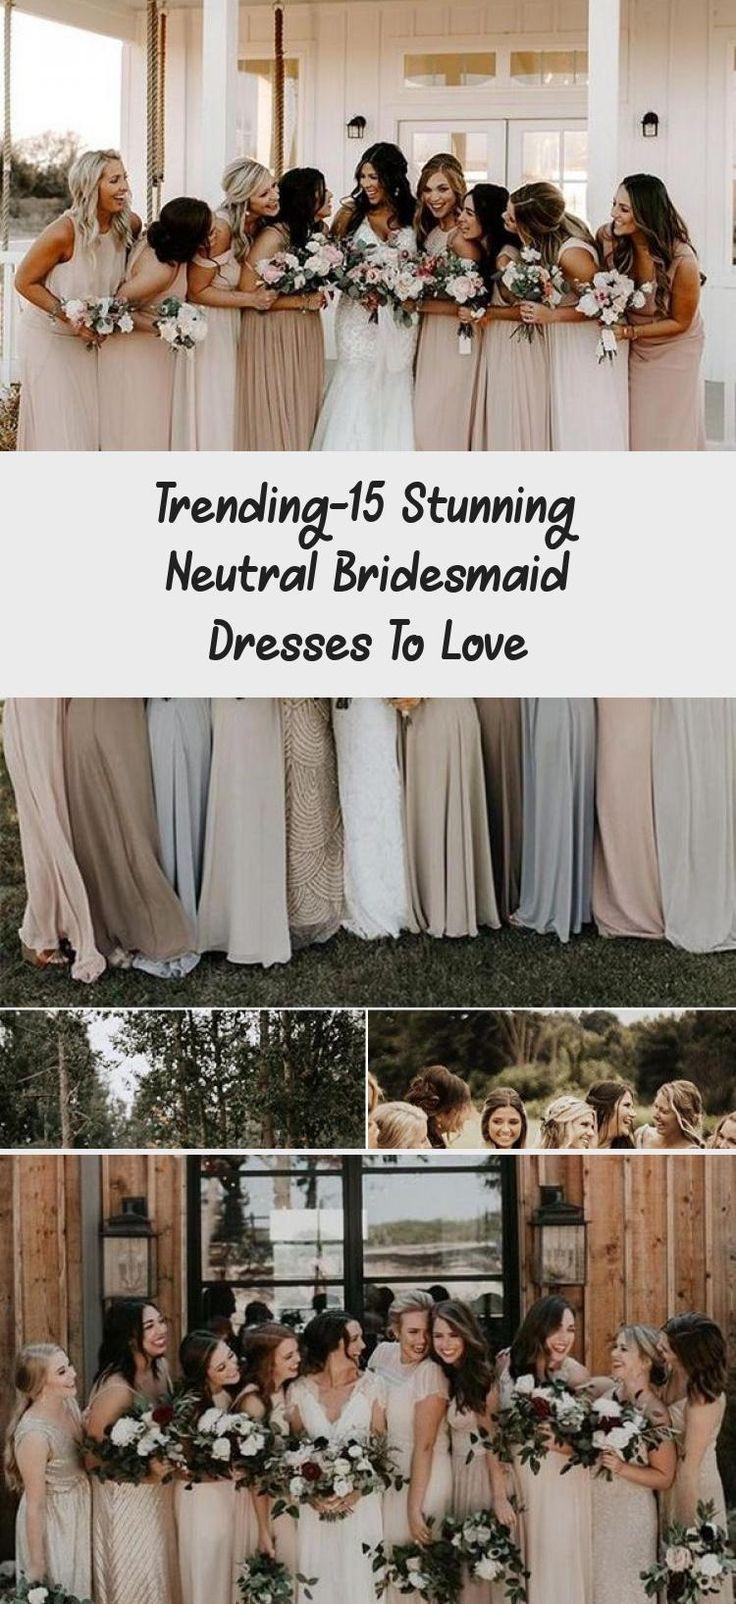 neutral champagne bridesmaid dresses #obde #weddingideas2019